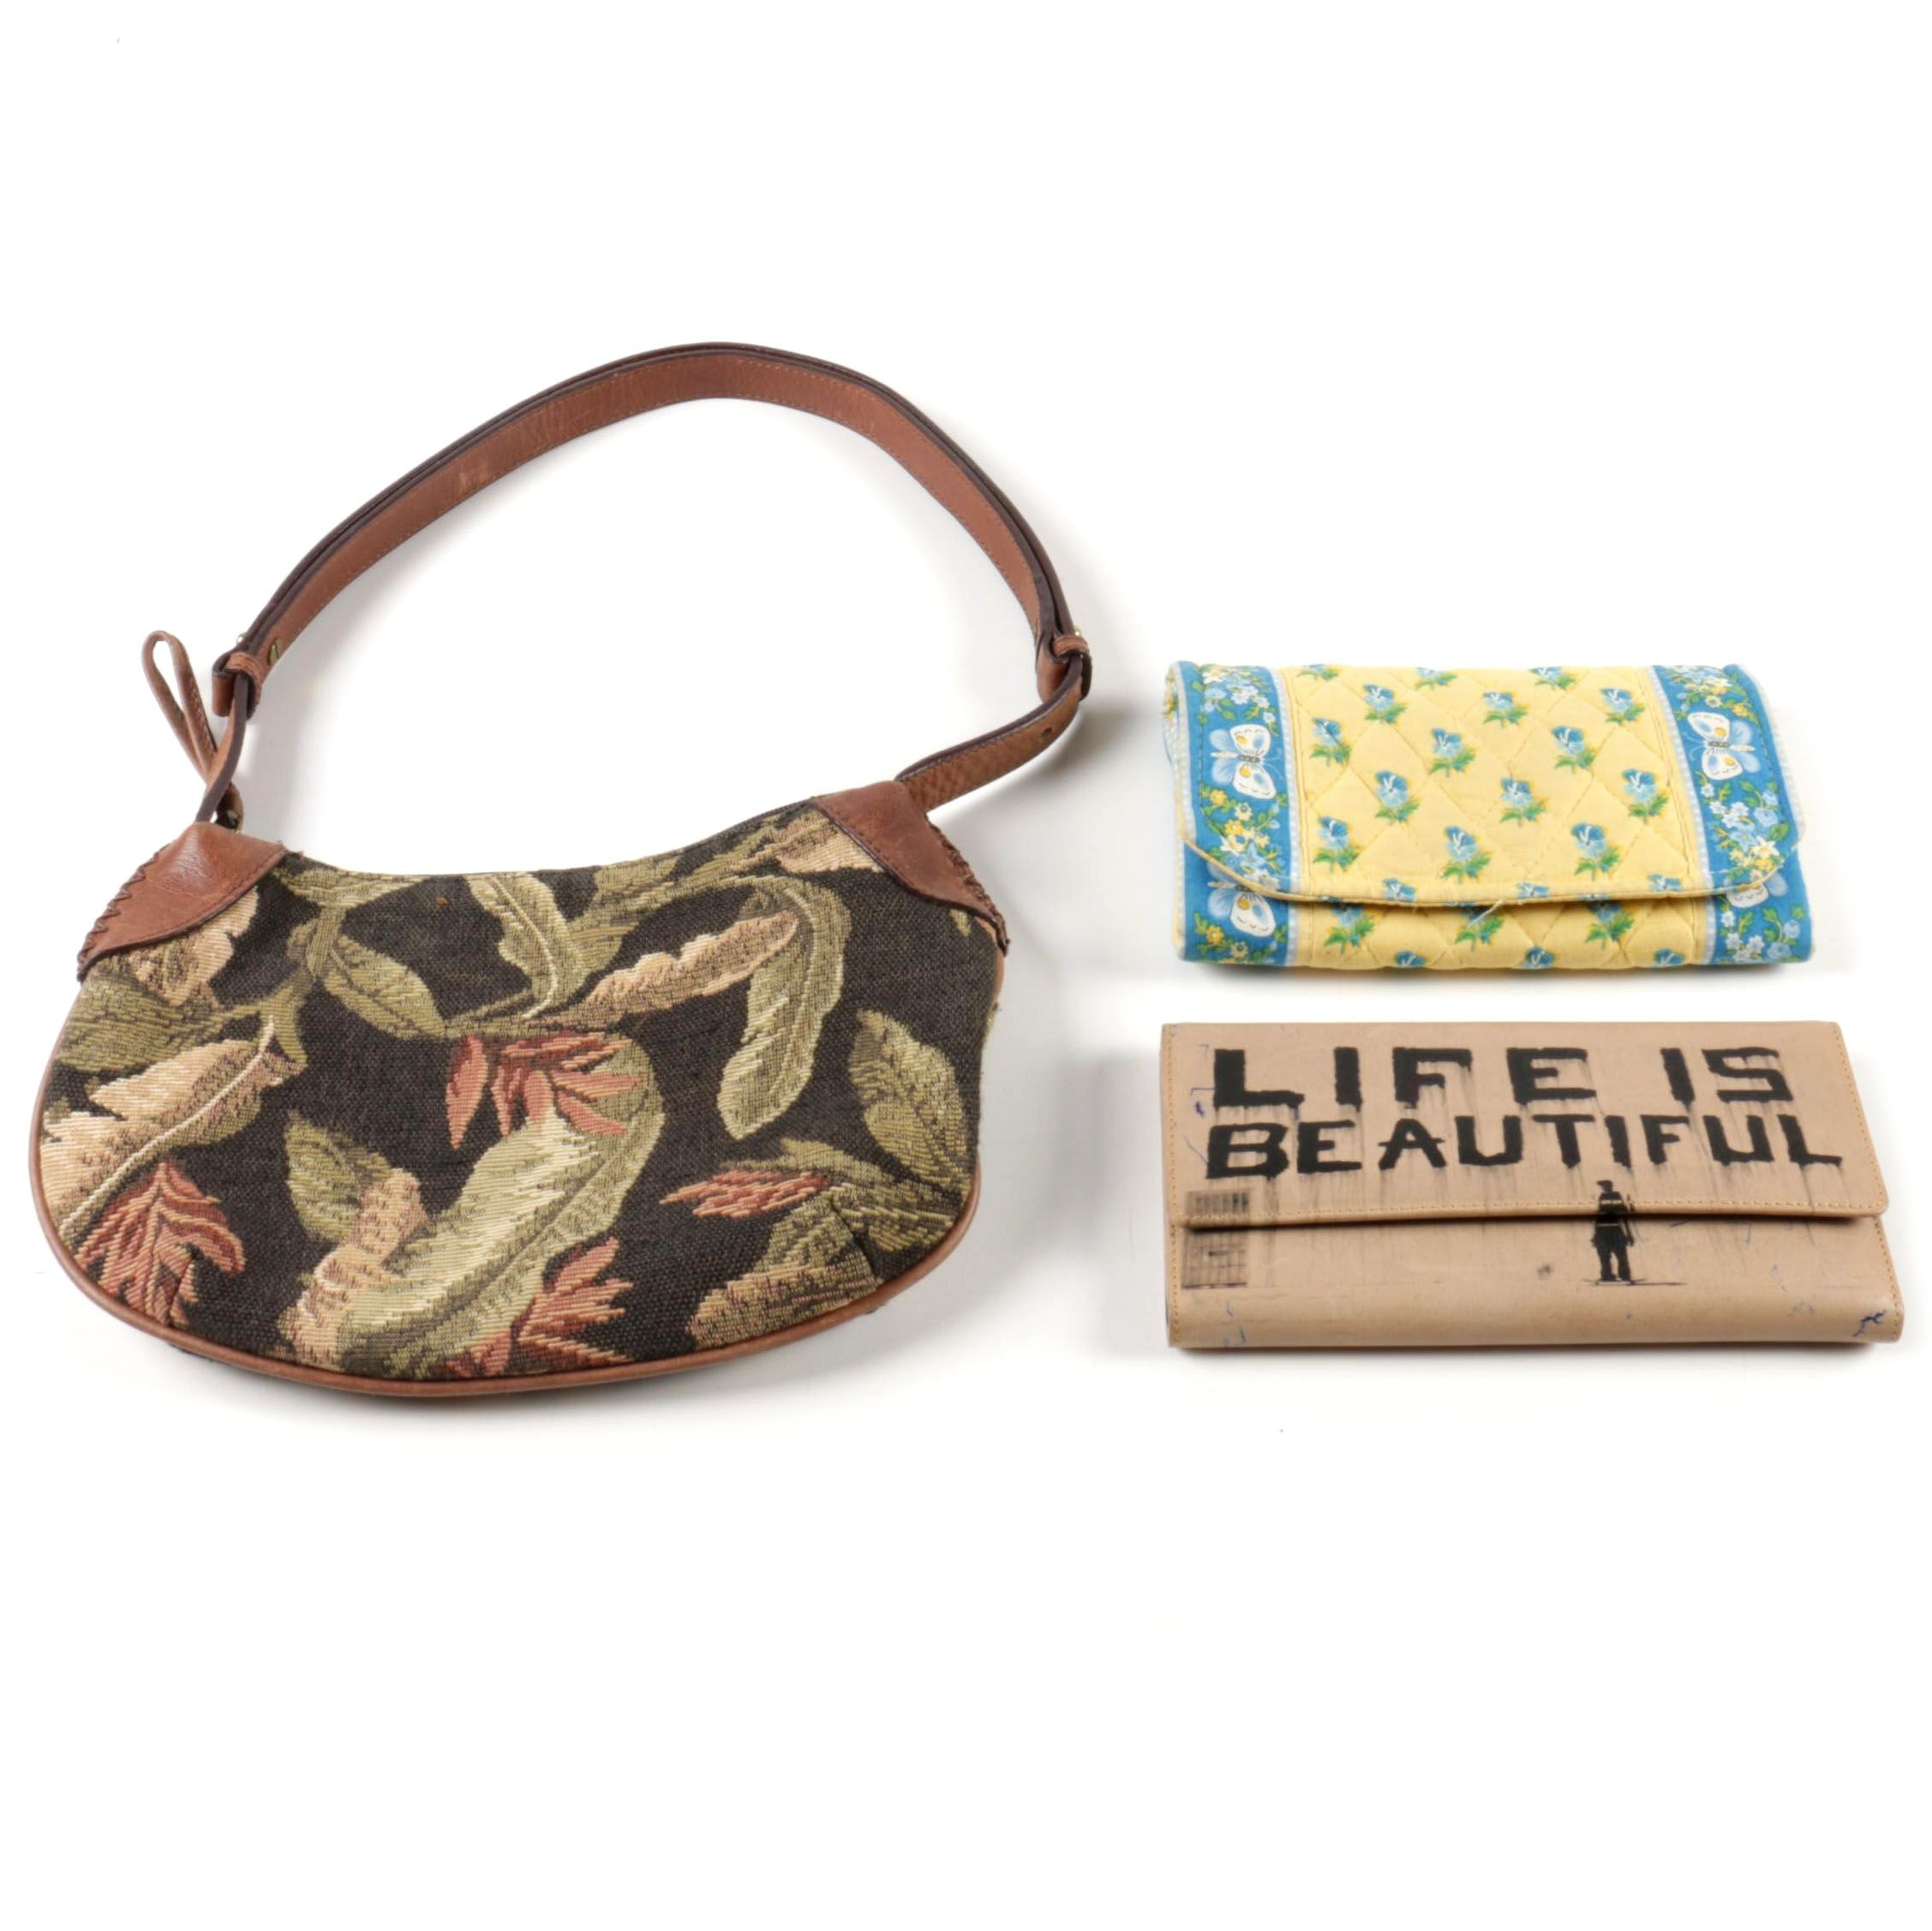 Handbag and Wallets with Tommy Bahama